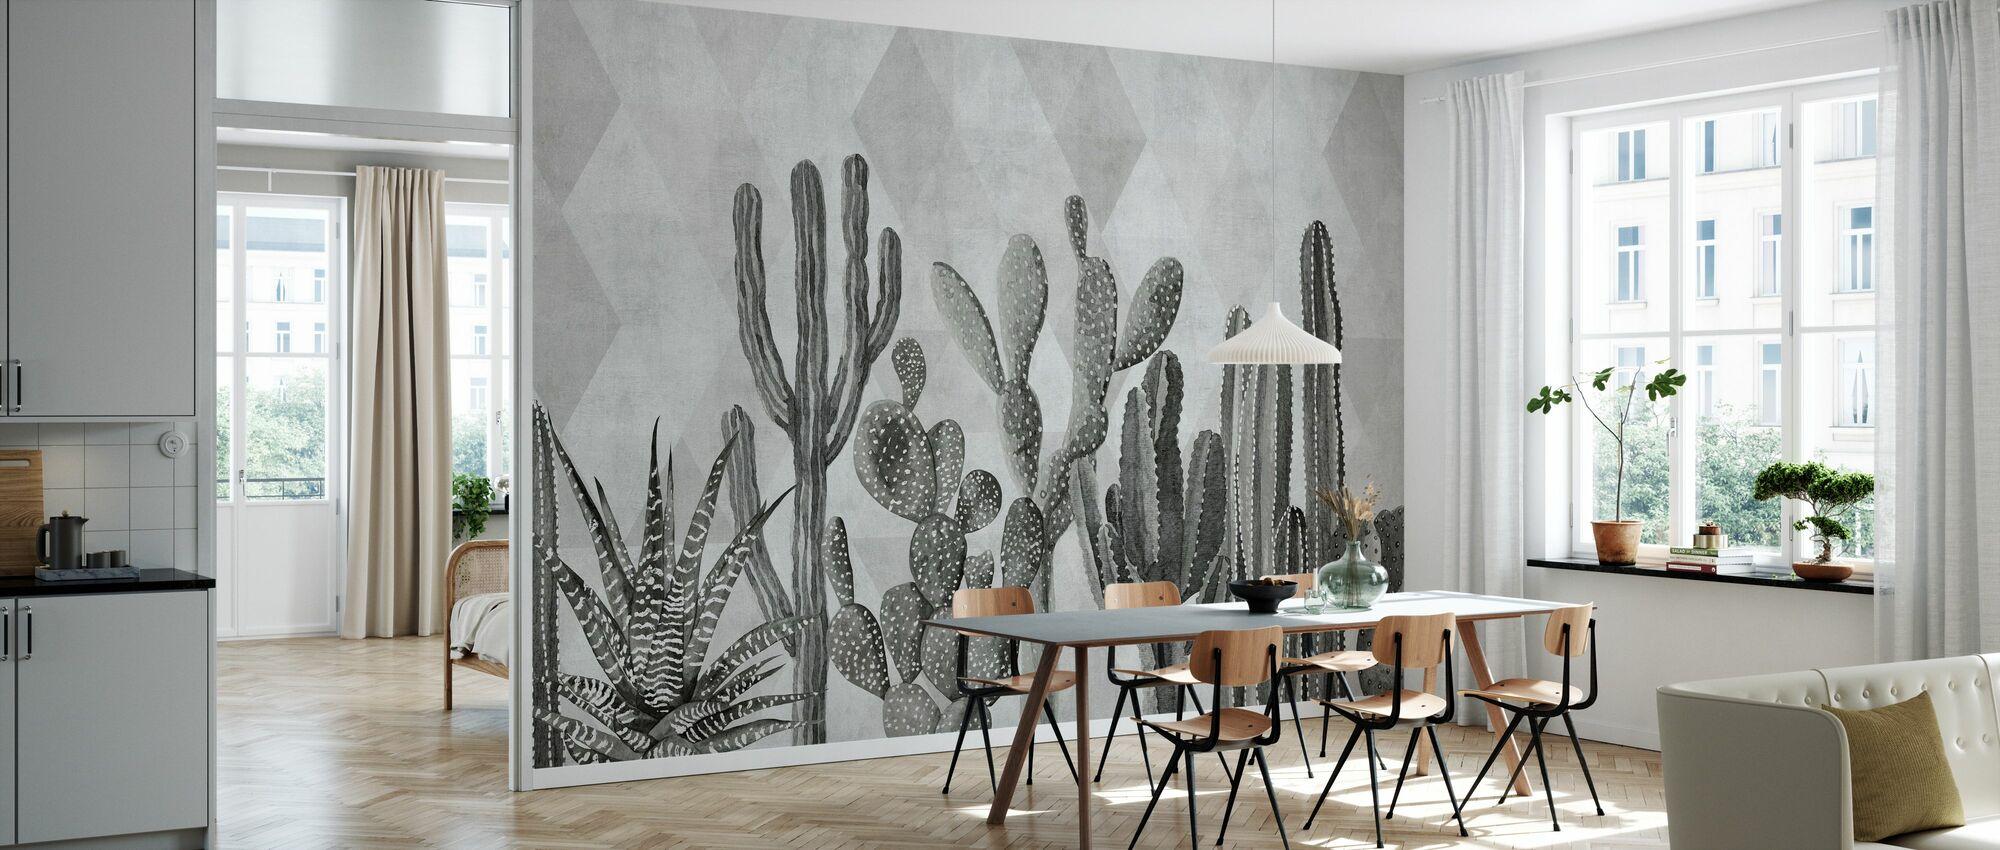 Atacama Cactus II - Bw - Wallpaper - Kitchen